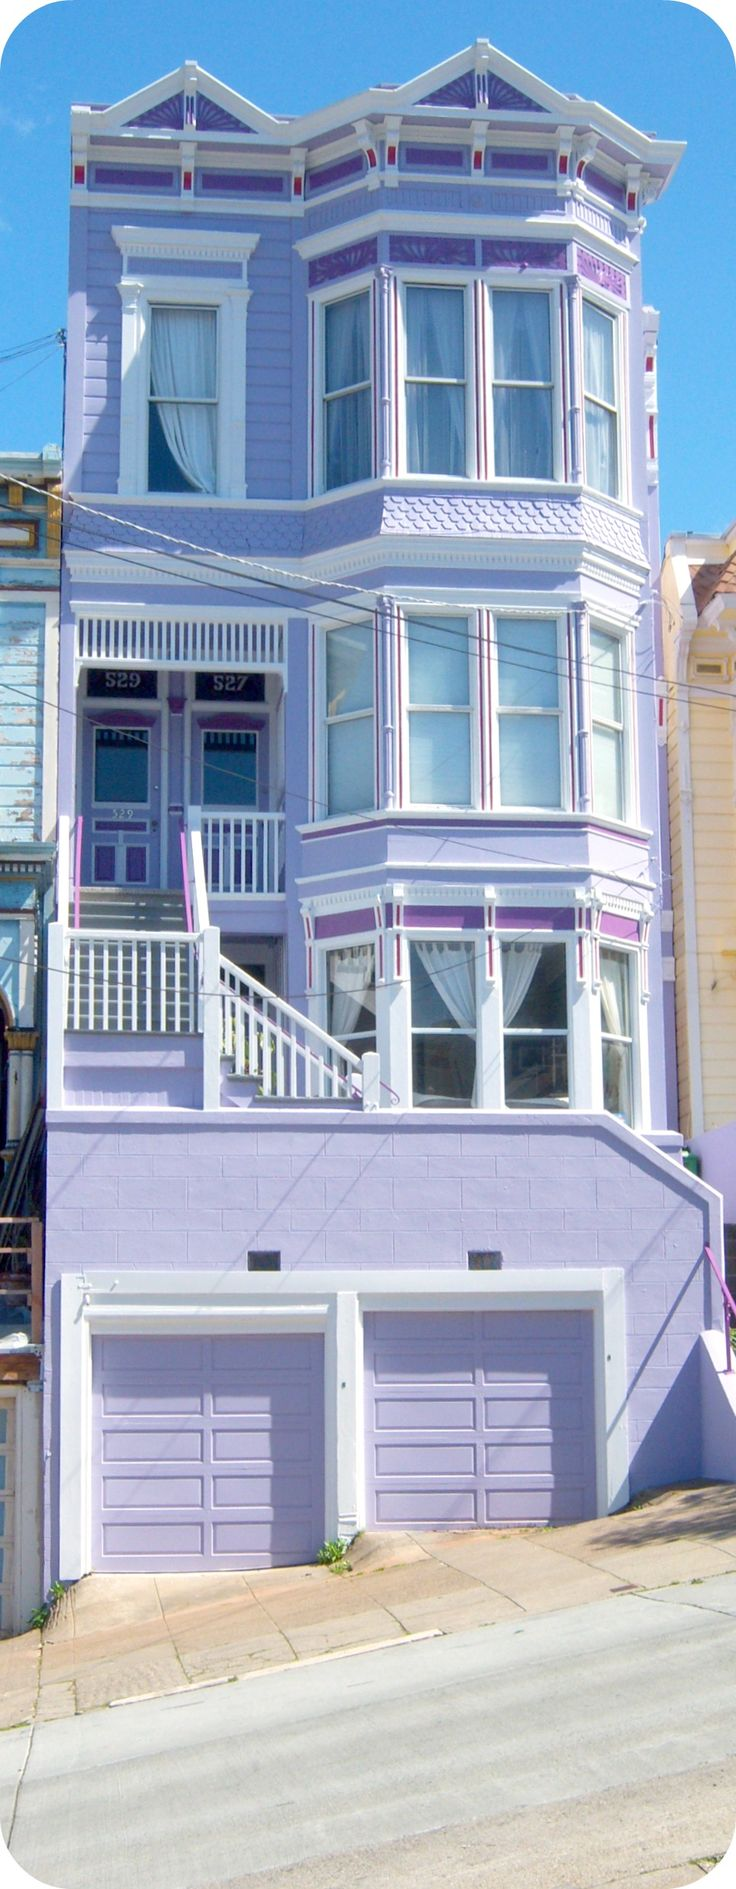 Beautiful San Francisco Home. Mighty purple hill